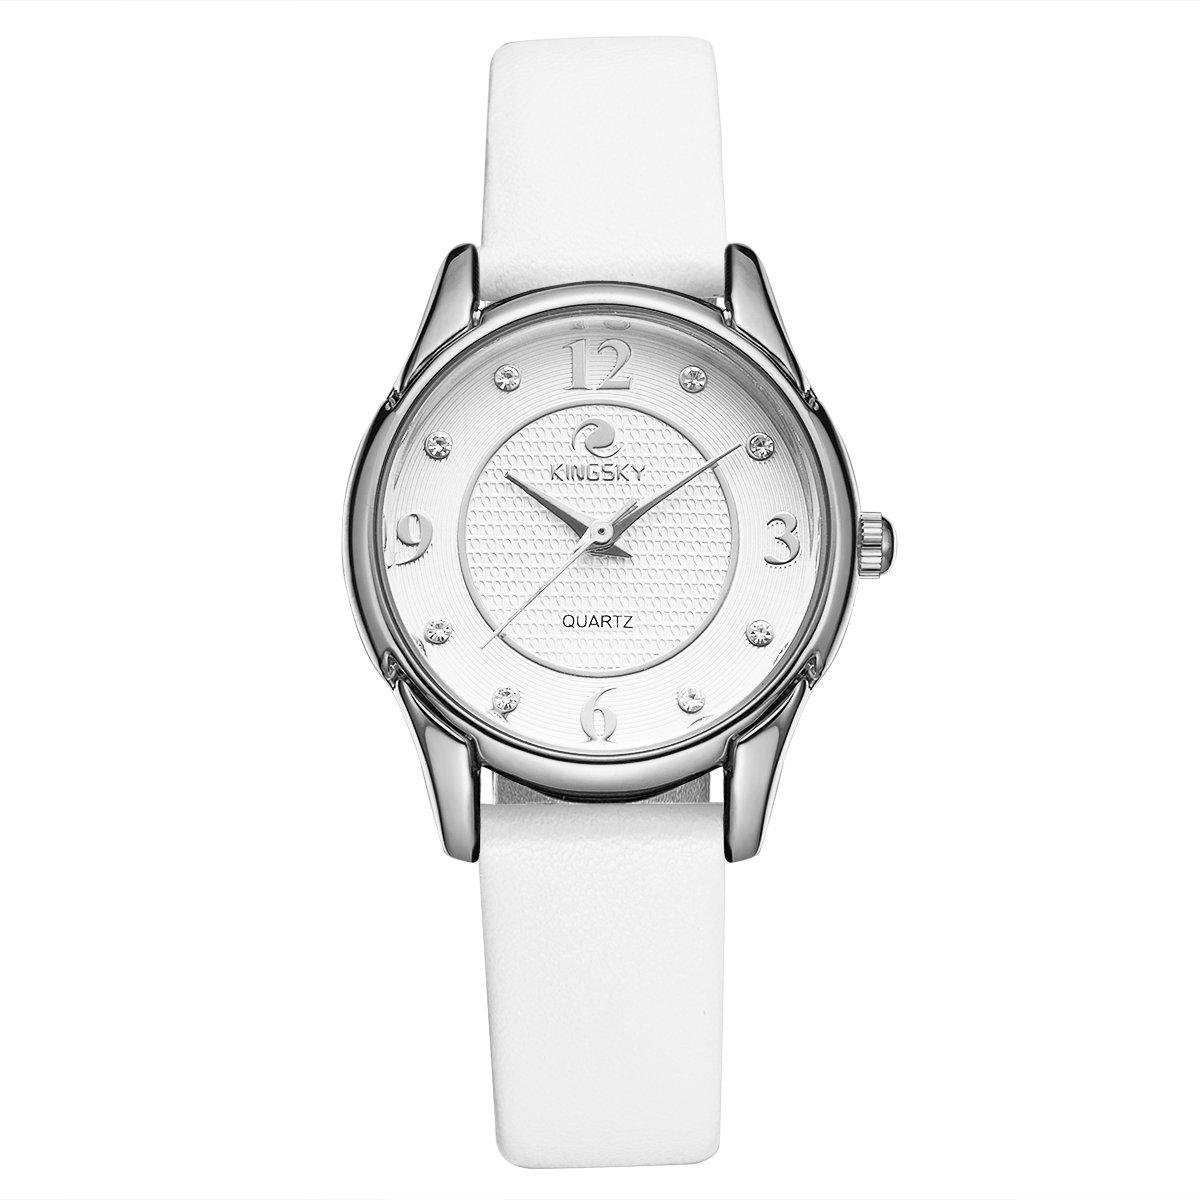 Kingskyレディースカジュアル本革ストラップ日本インポートQuartz Movement Wrist Watches big シルバーホワイト B0776PSJM4 シルバーホワイト シルバーホワイト